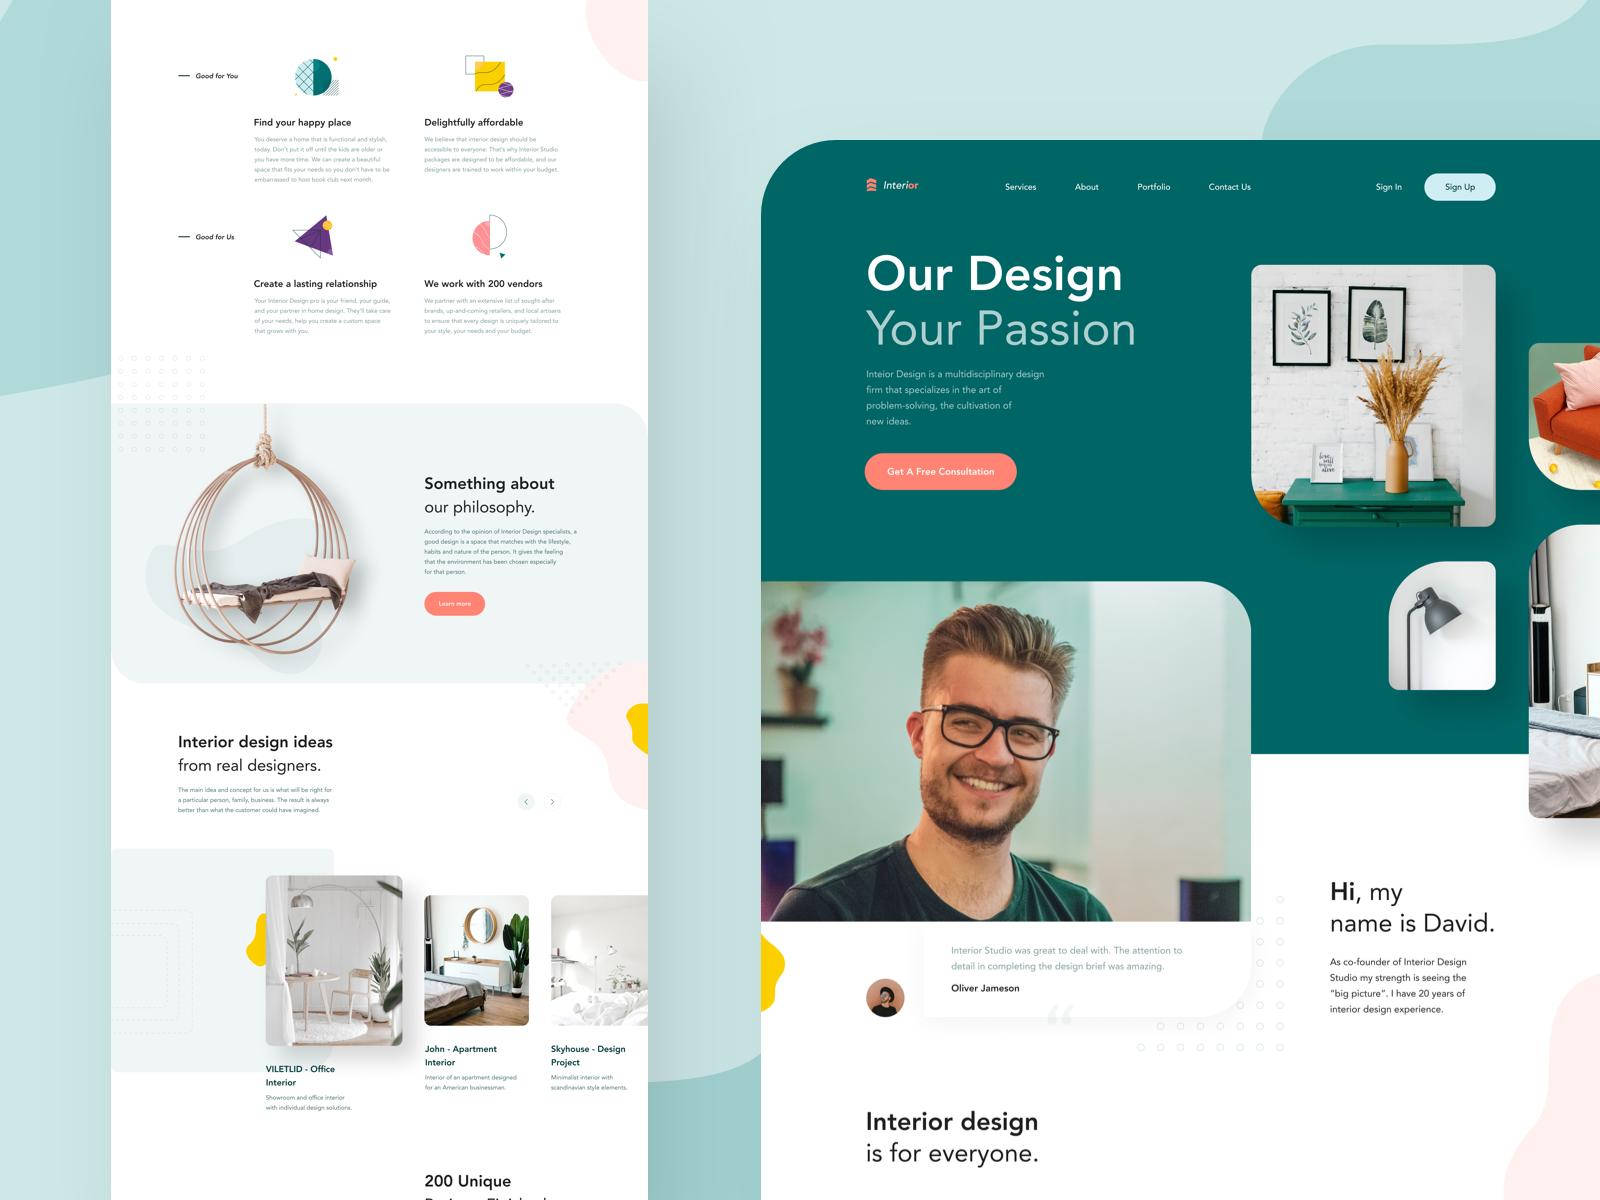 UI UX Design Inspiration